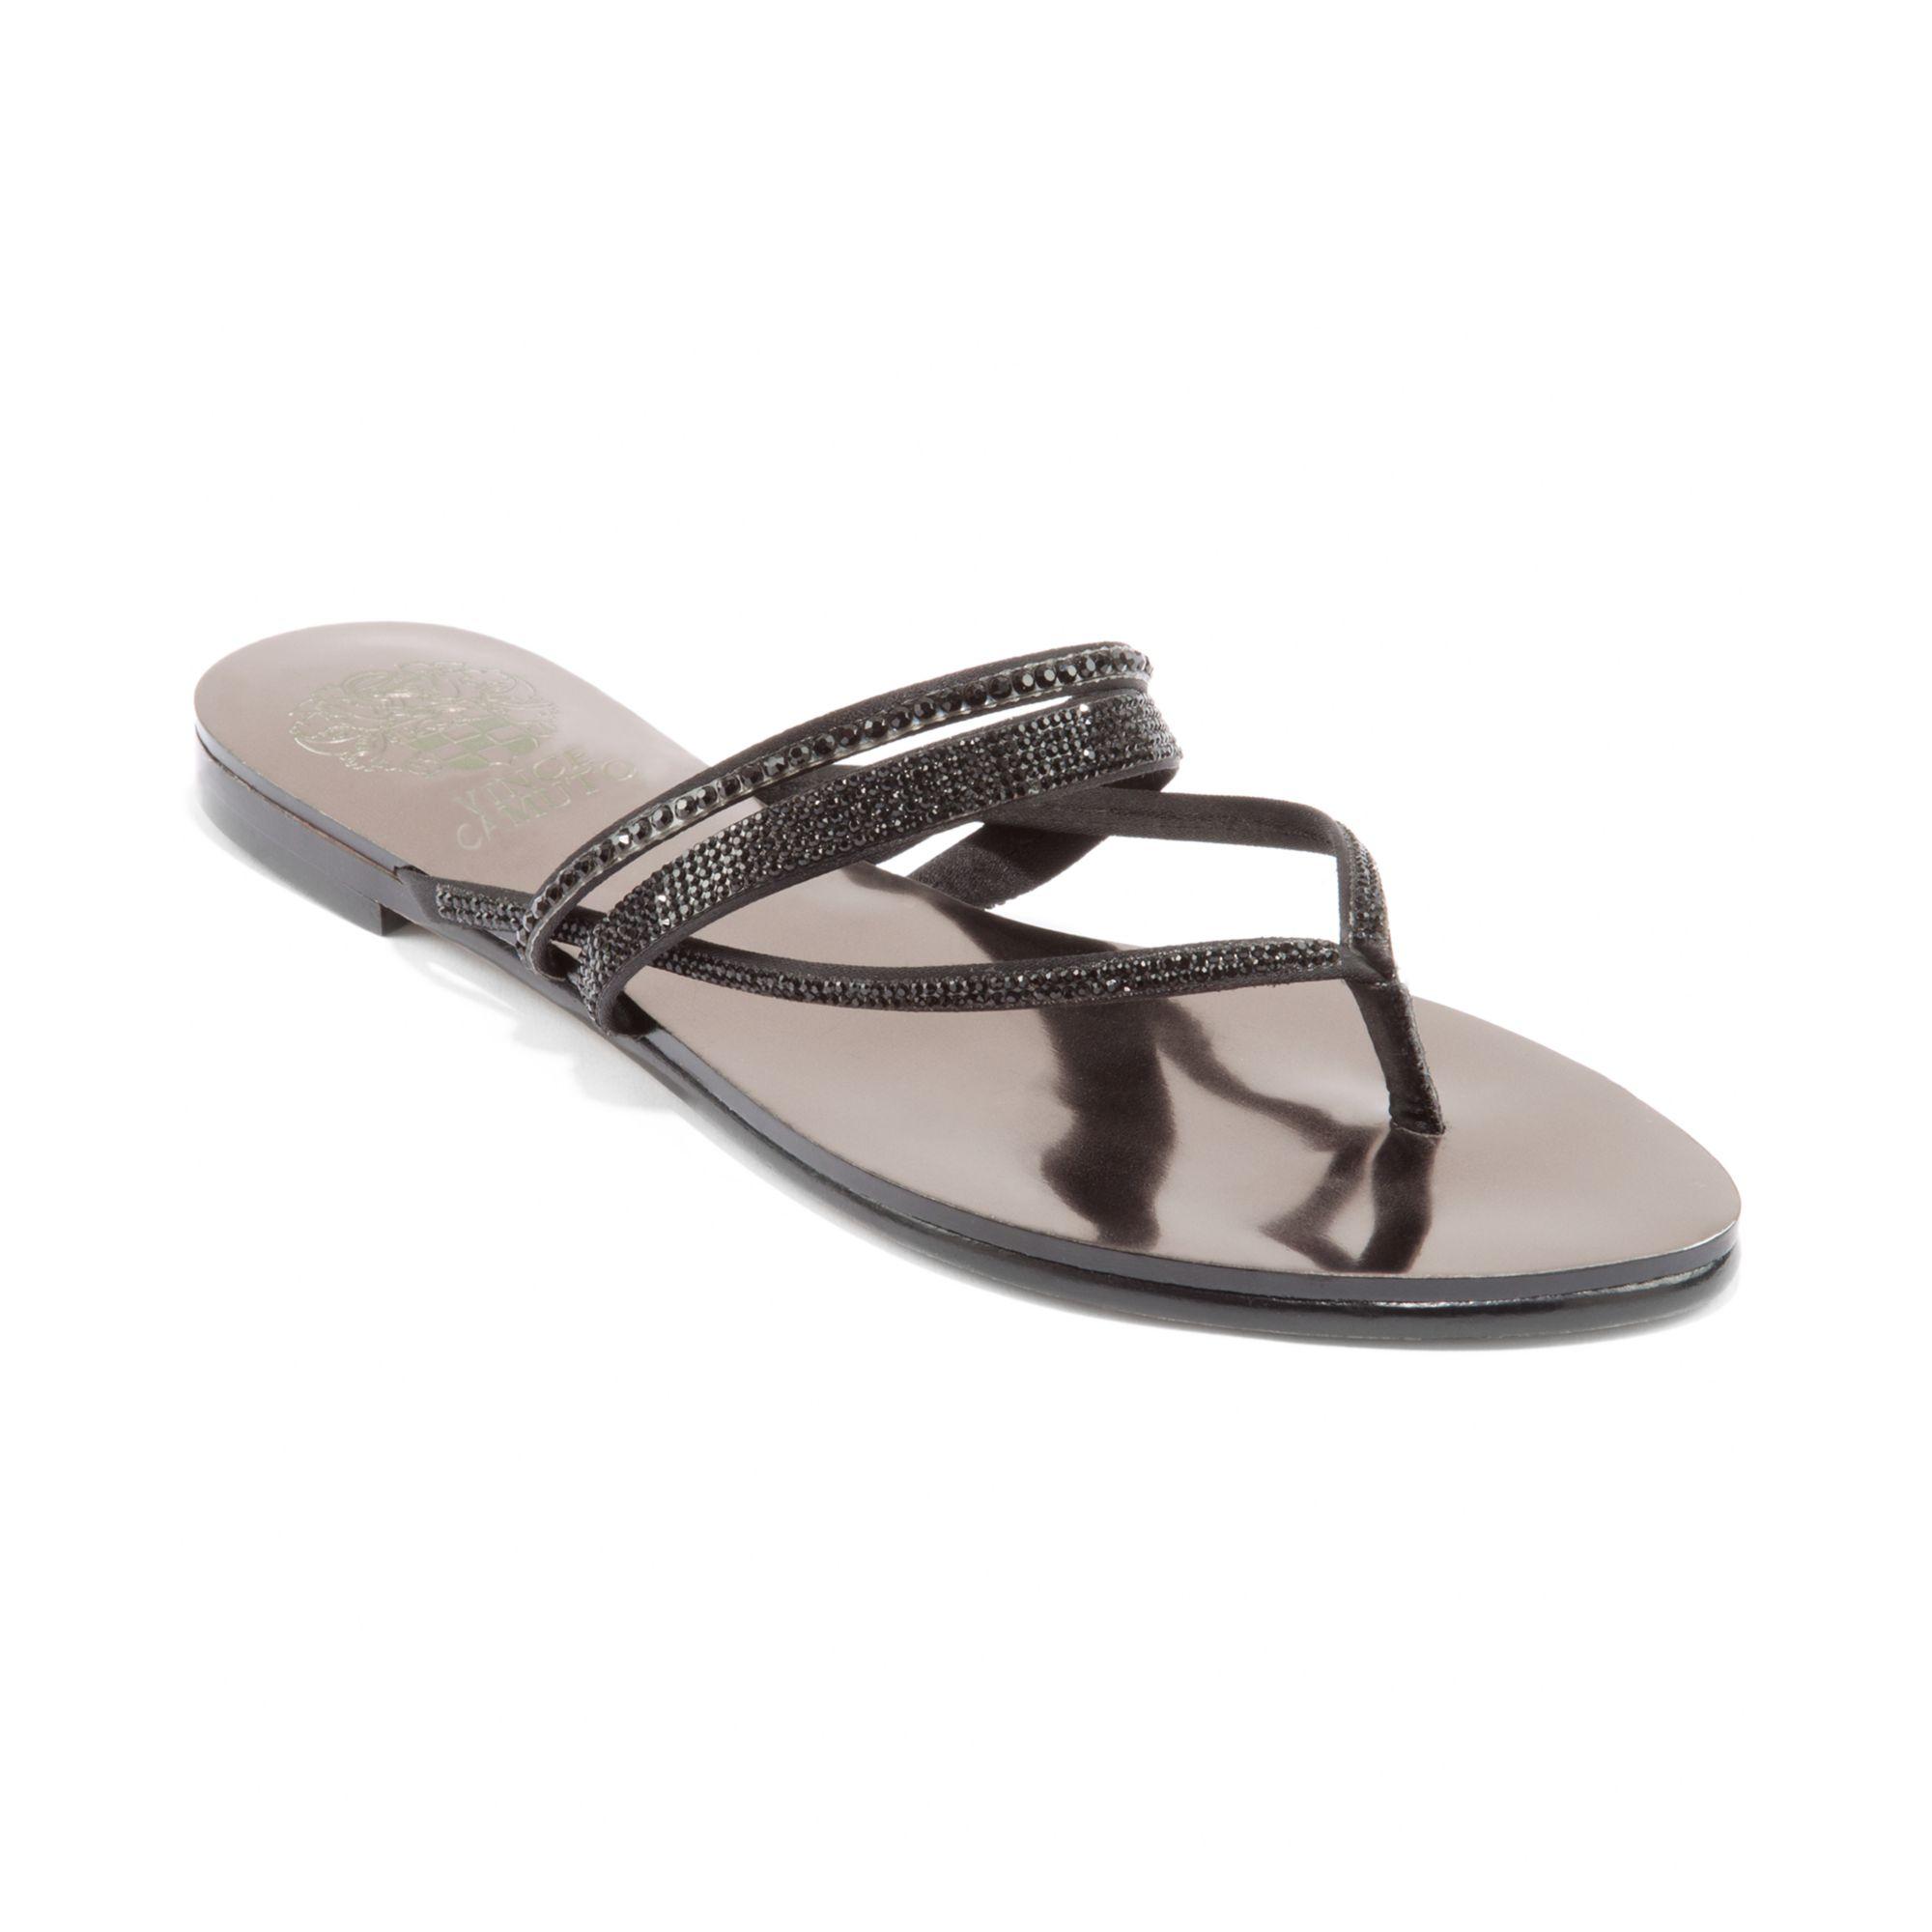 Vince Camuto Evora Jewled Flat Thong Sandals In Black Lyst